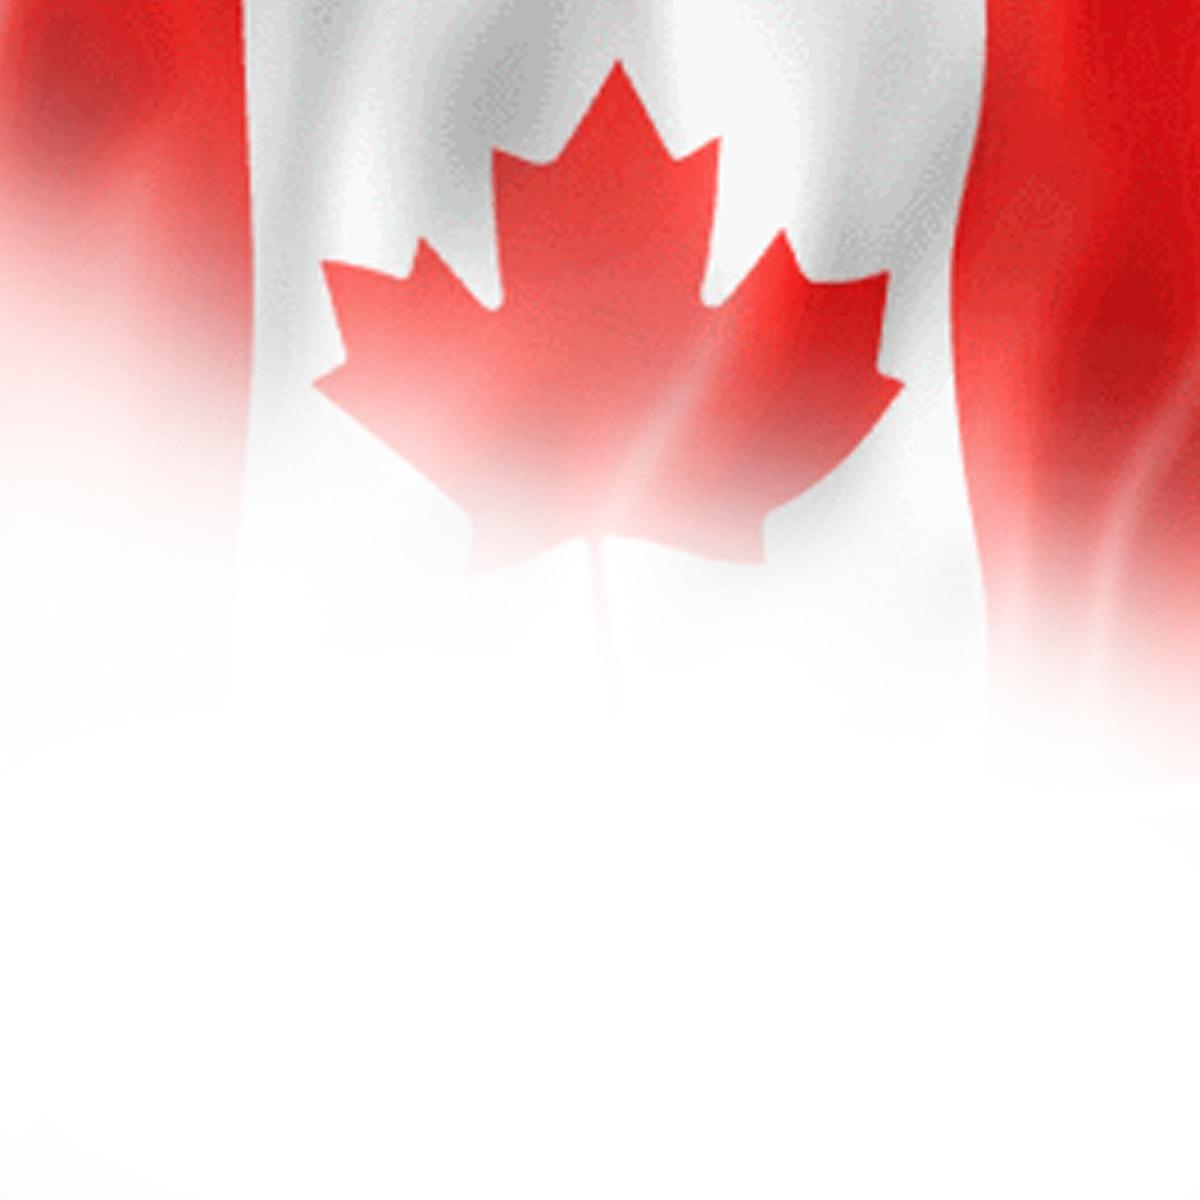 https://myscs.org/wp-content/uploads/2021/06/Canada-Flag.png